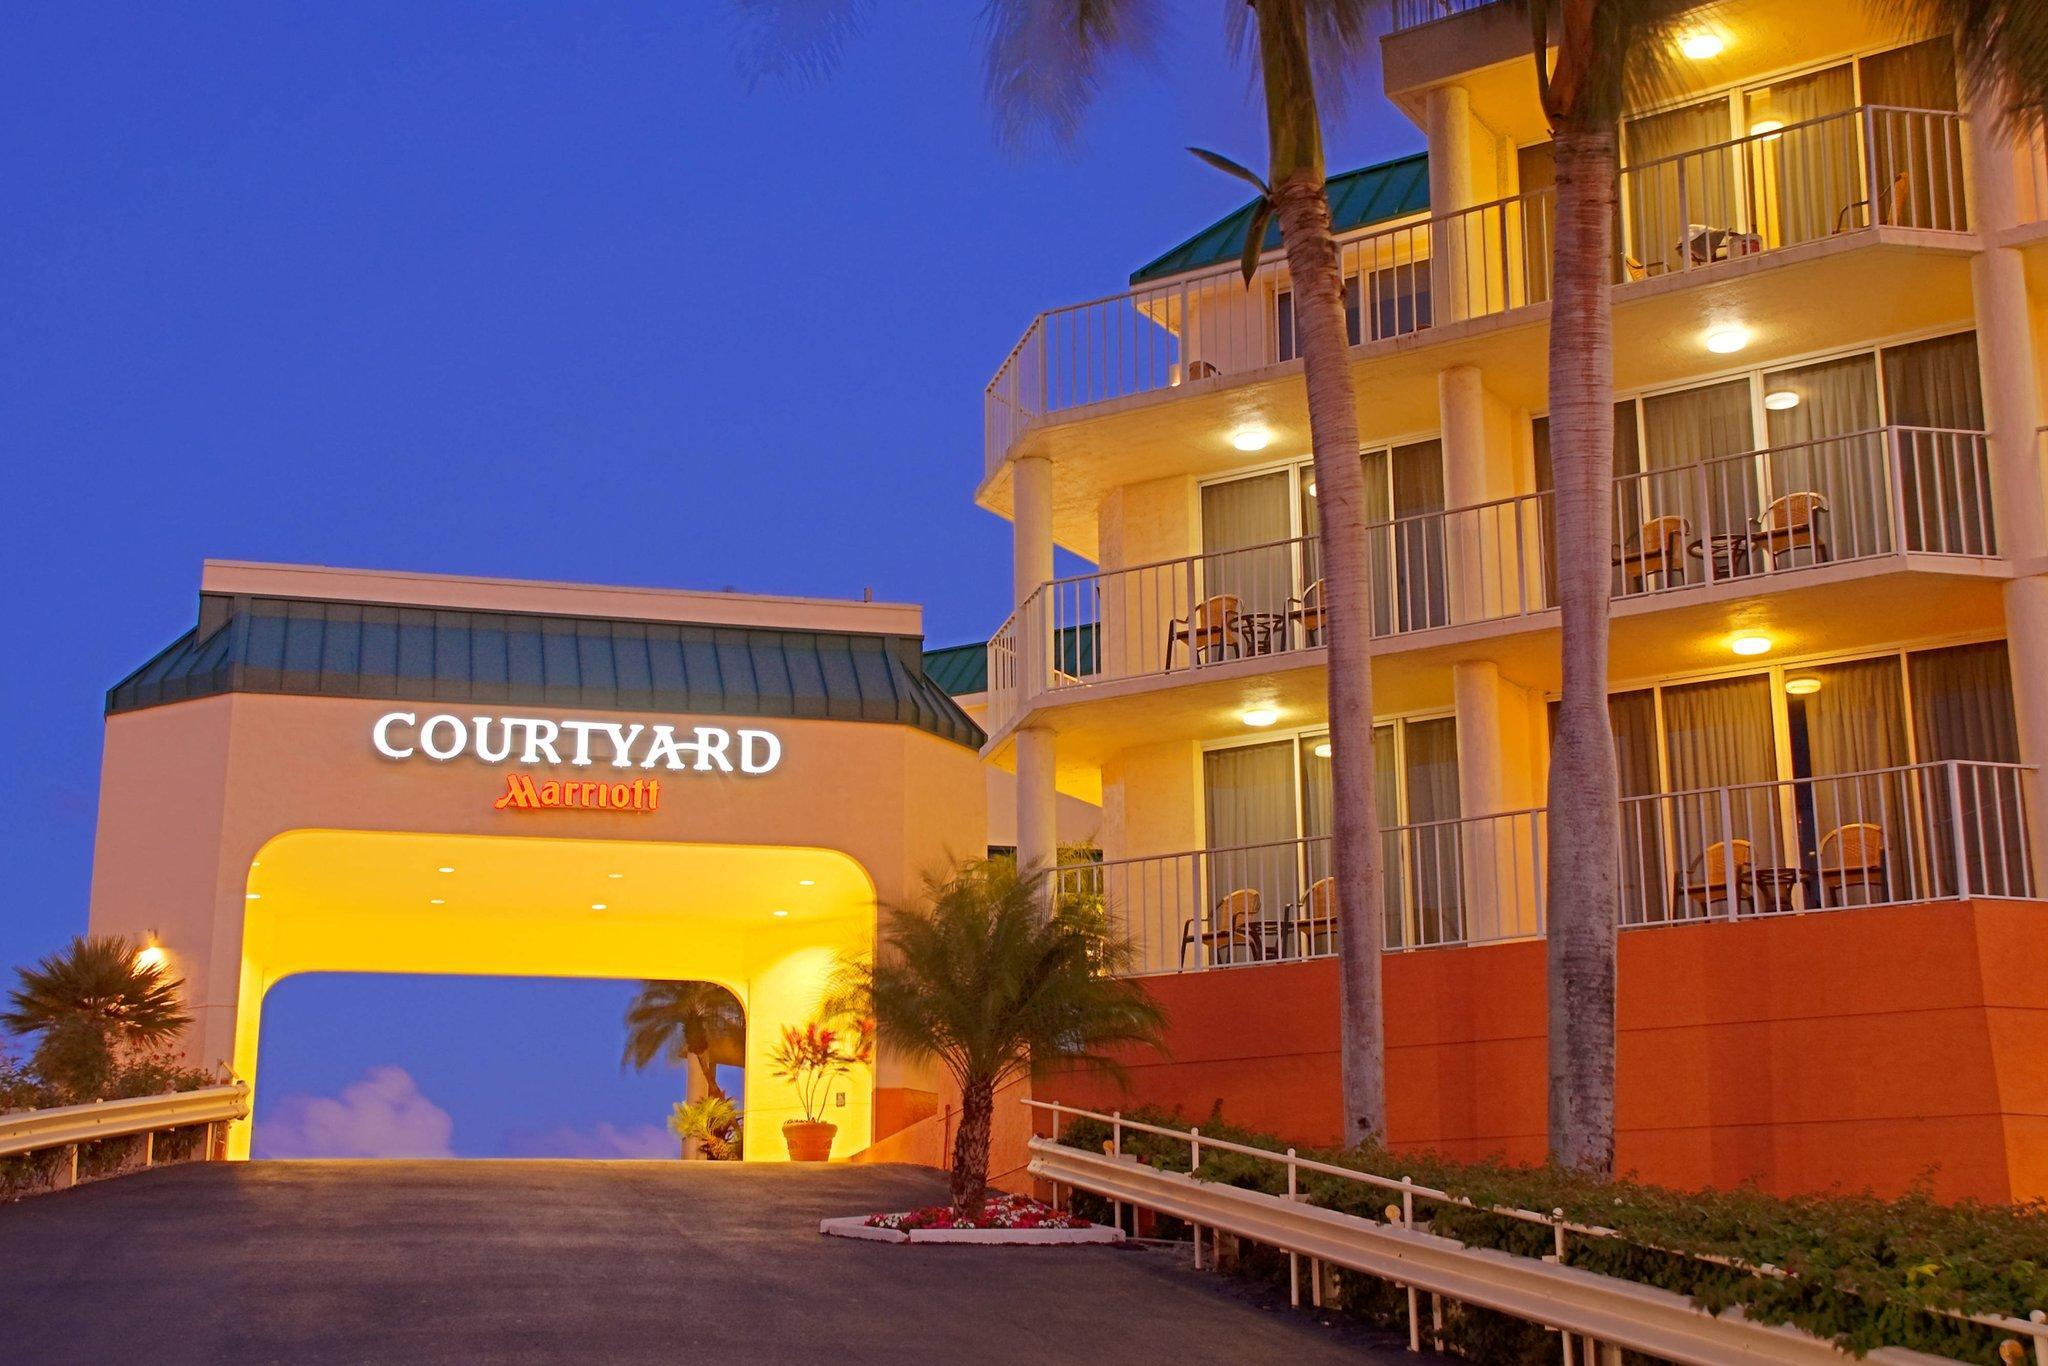 Courtyard Key Largo